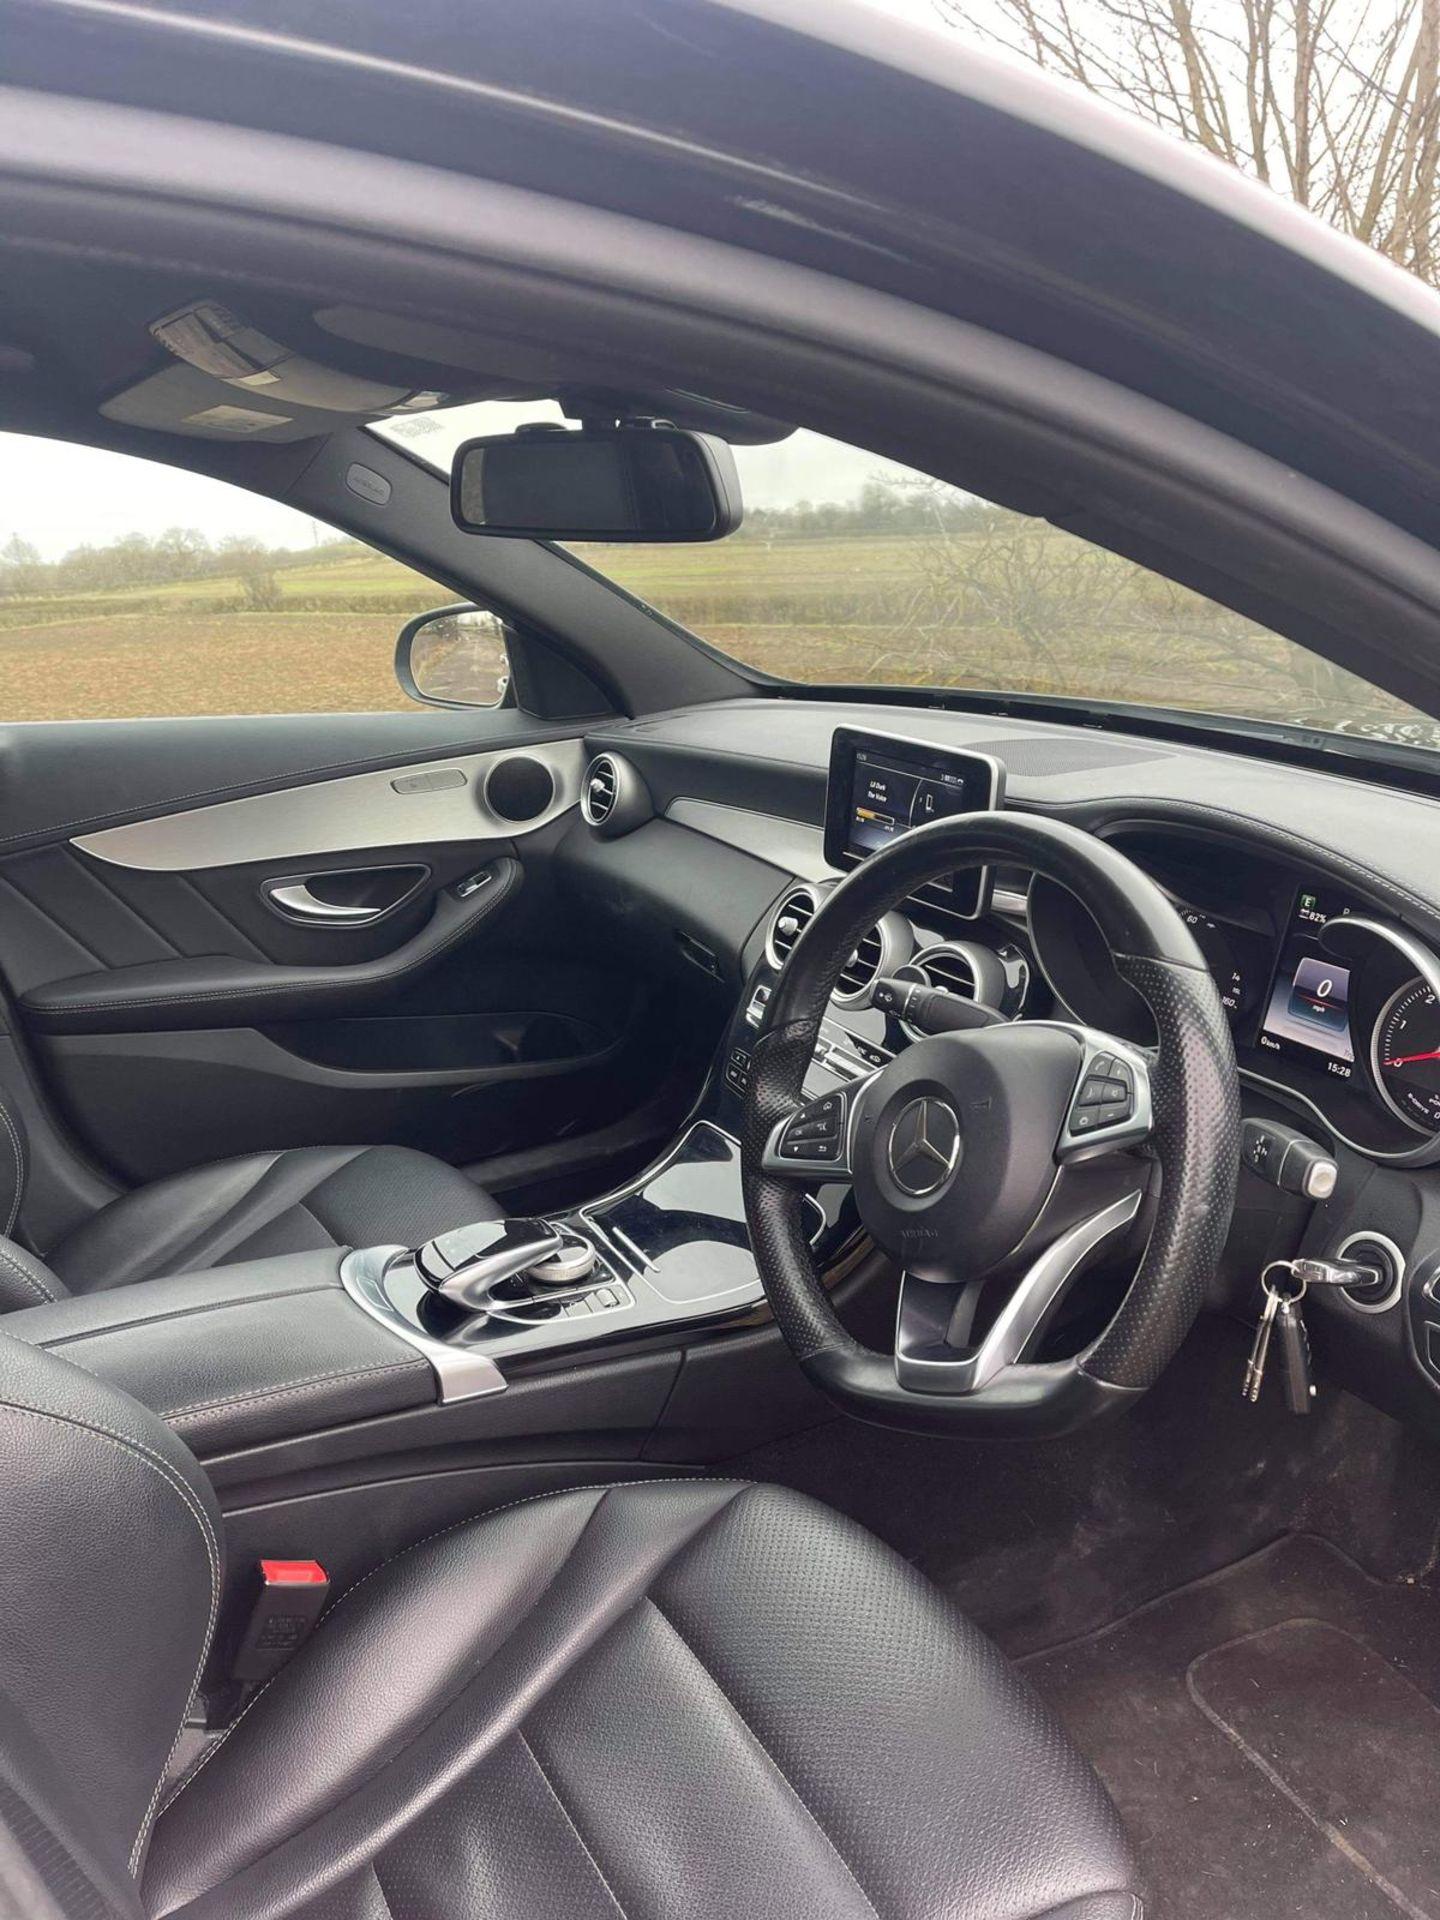 2015 MERCEDES-BENZ C300 AMG LINE BLUETEC HYBRID A, BLACK, AUTOMATIC, ELECTRIC DIESEL, NO VAT - Image 10 of 13